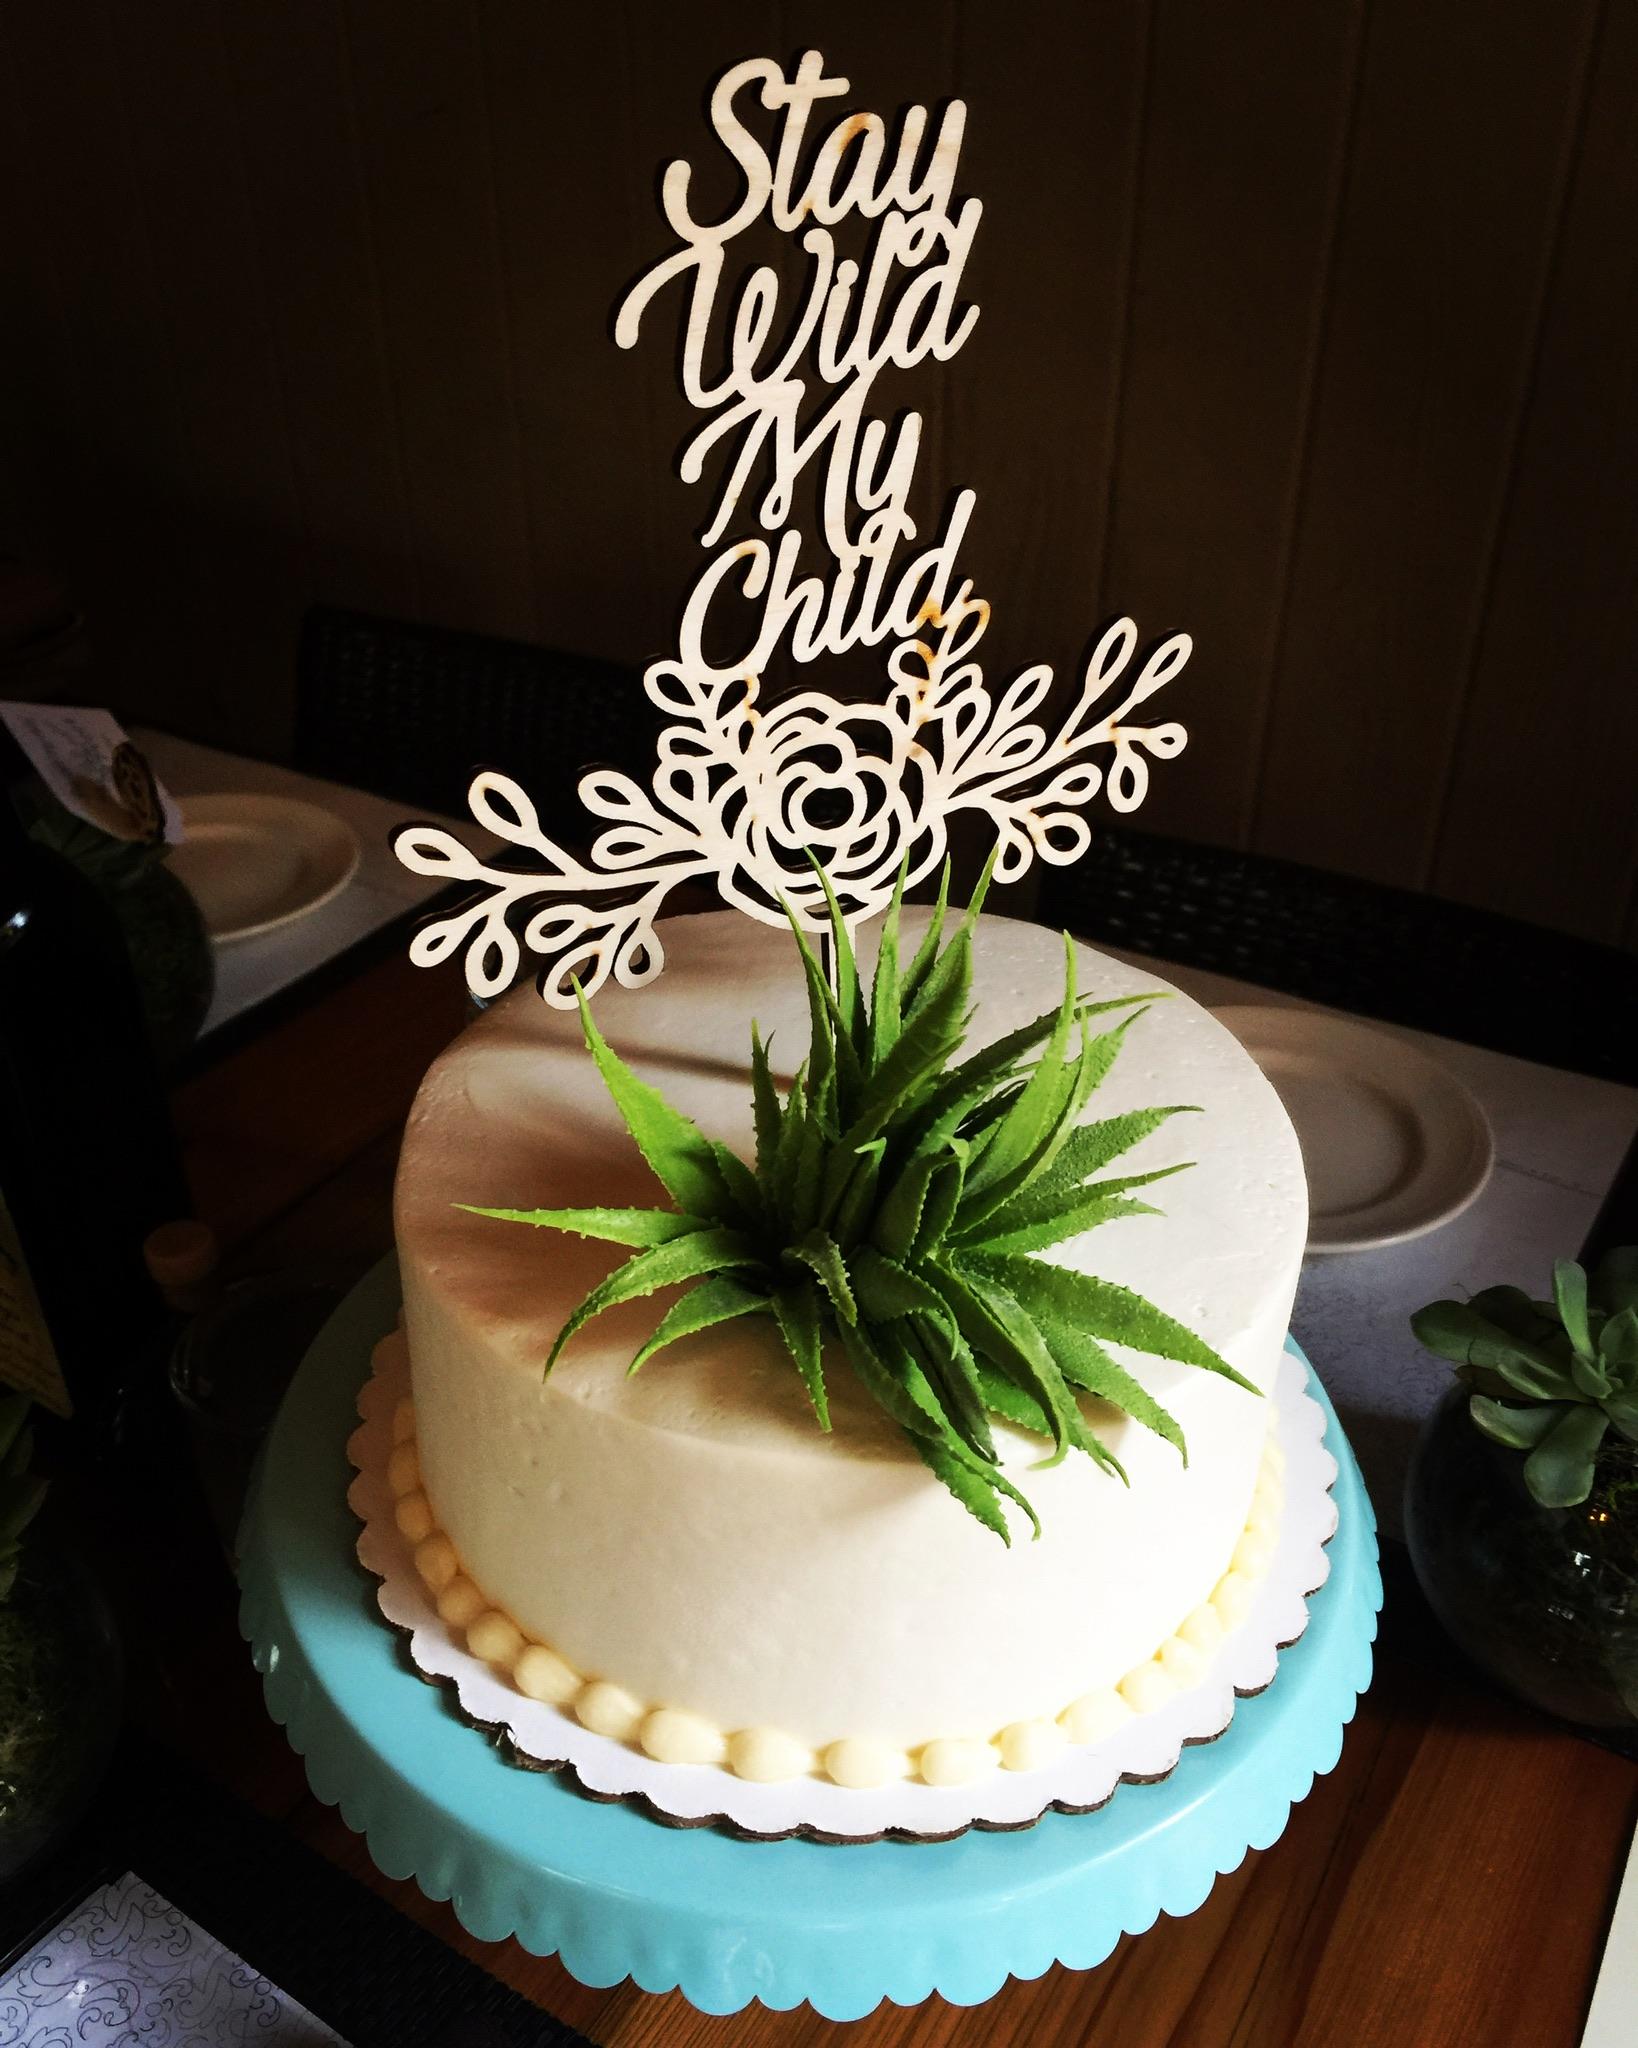 Laser cut cake topper in wood